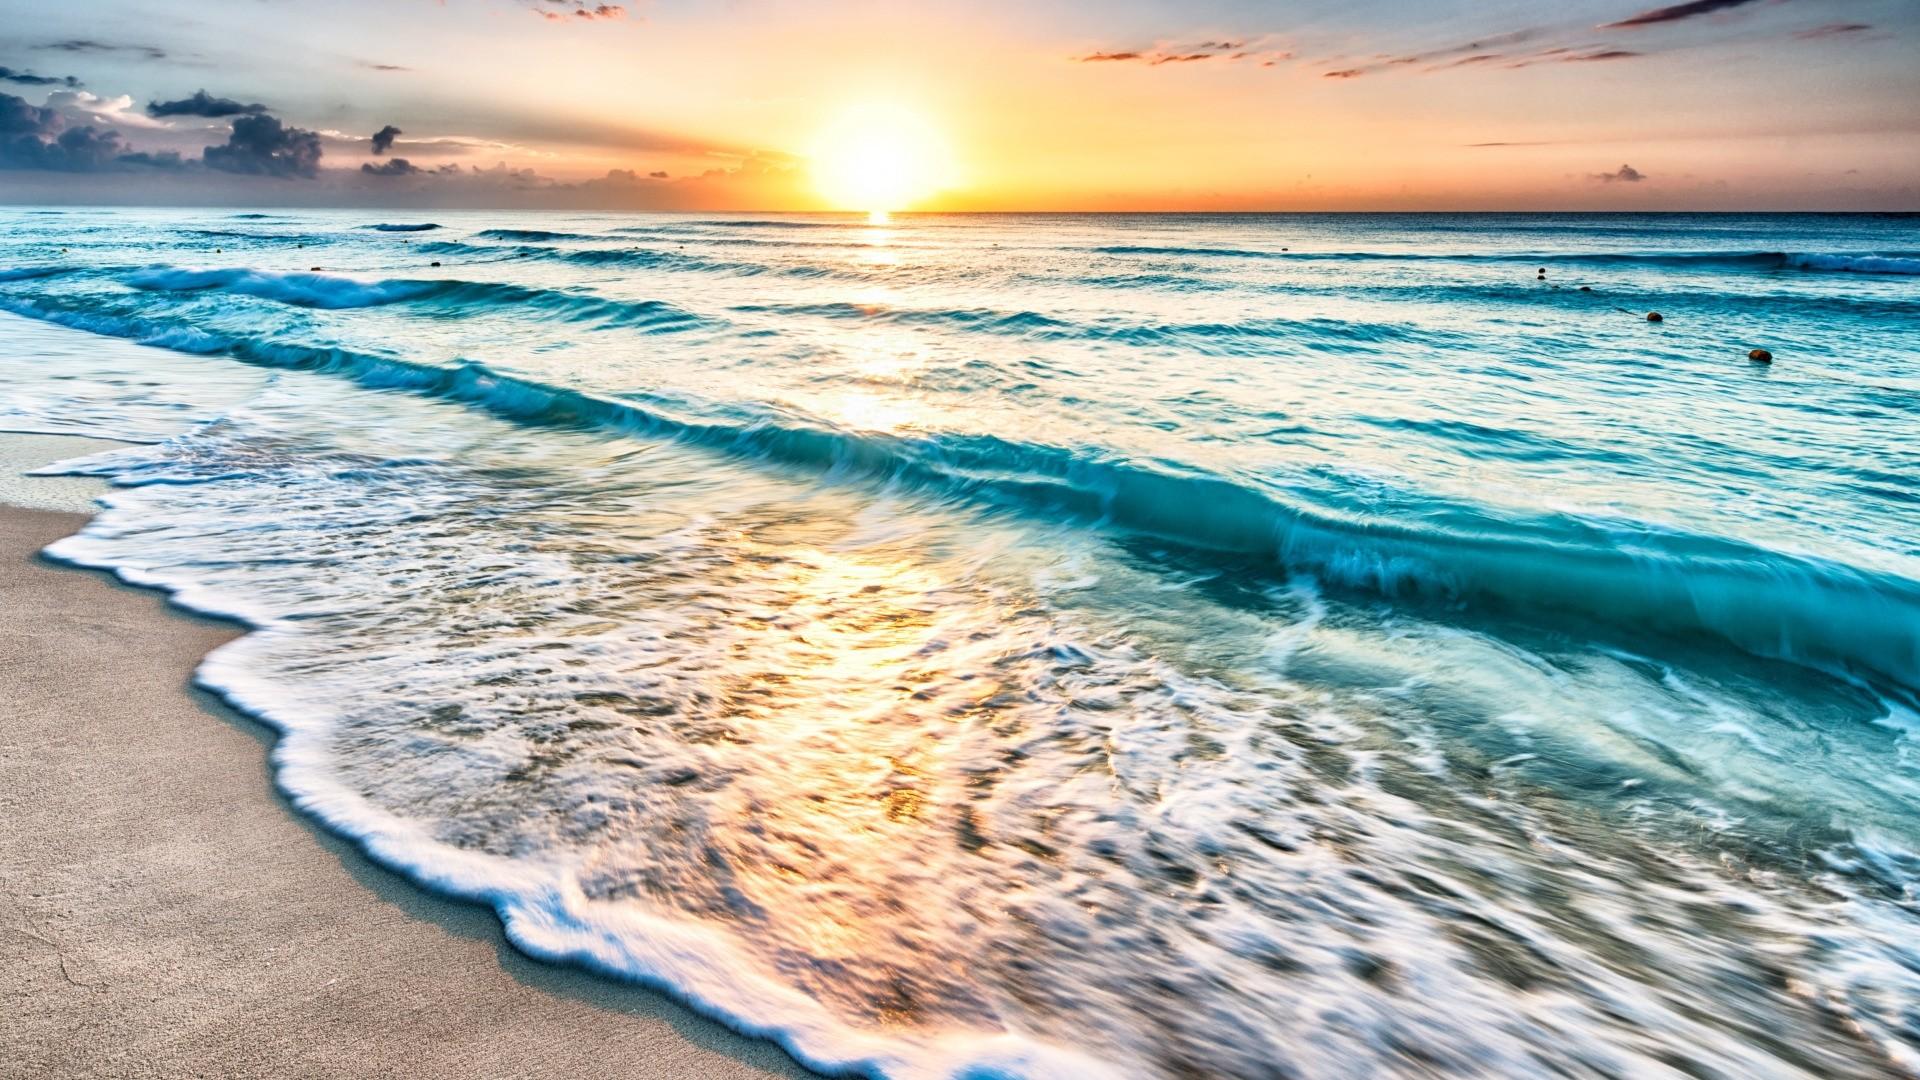 Sea PC Wallpaper HD